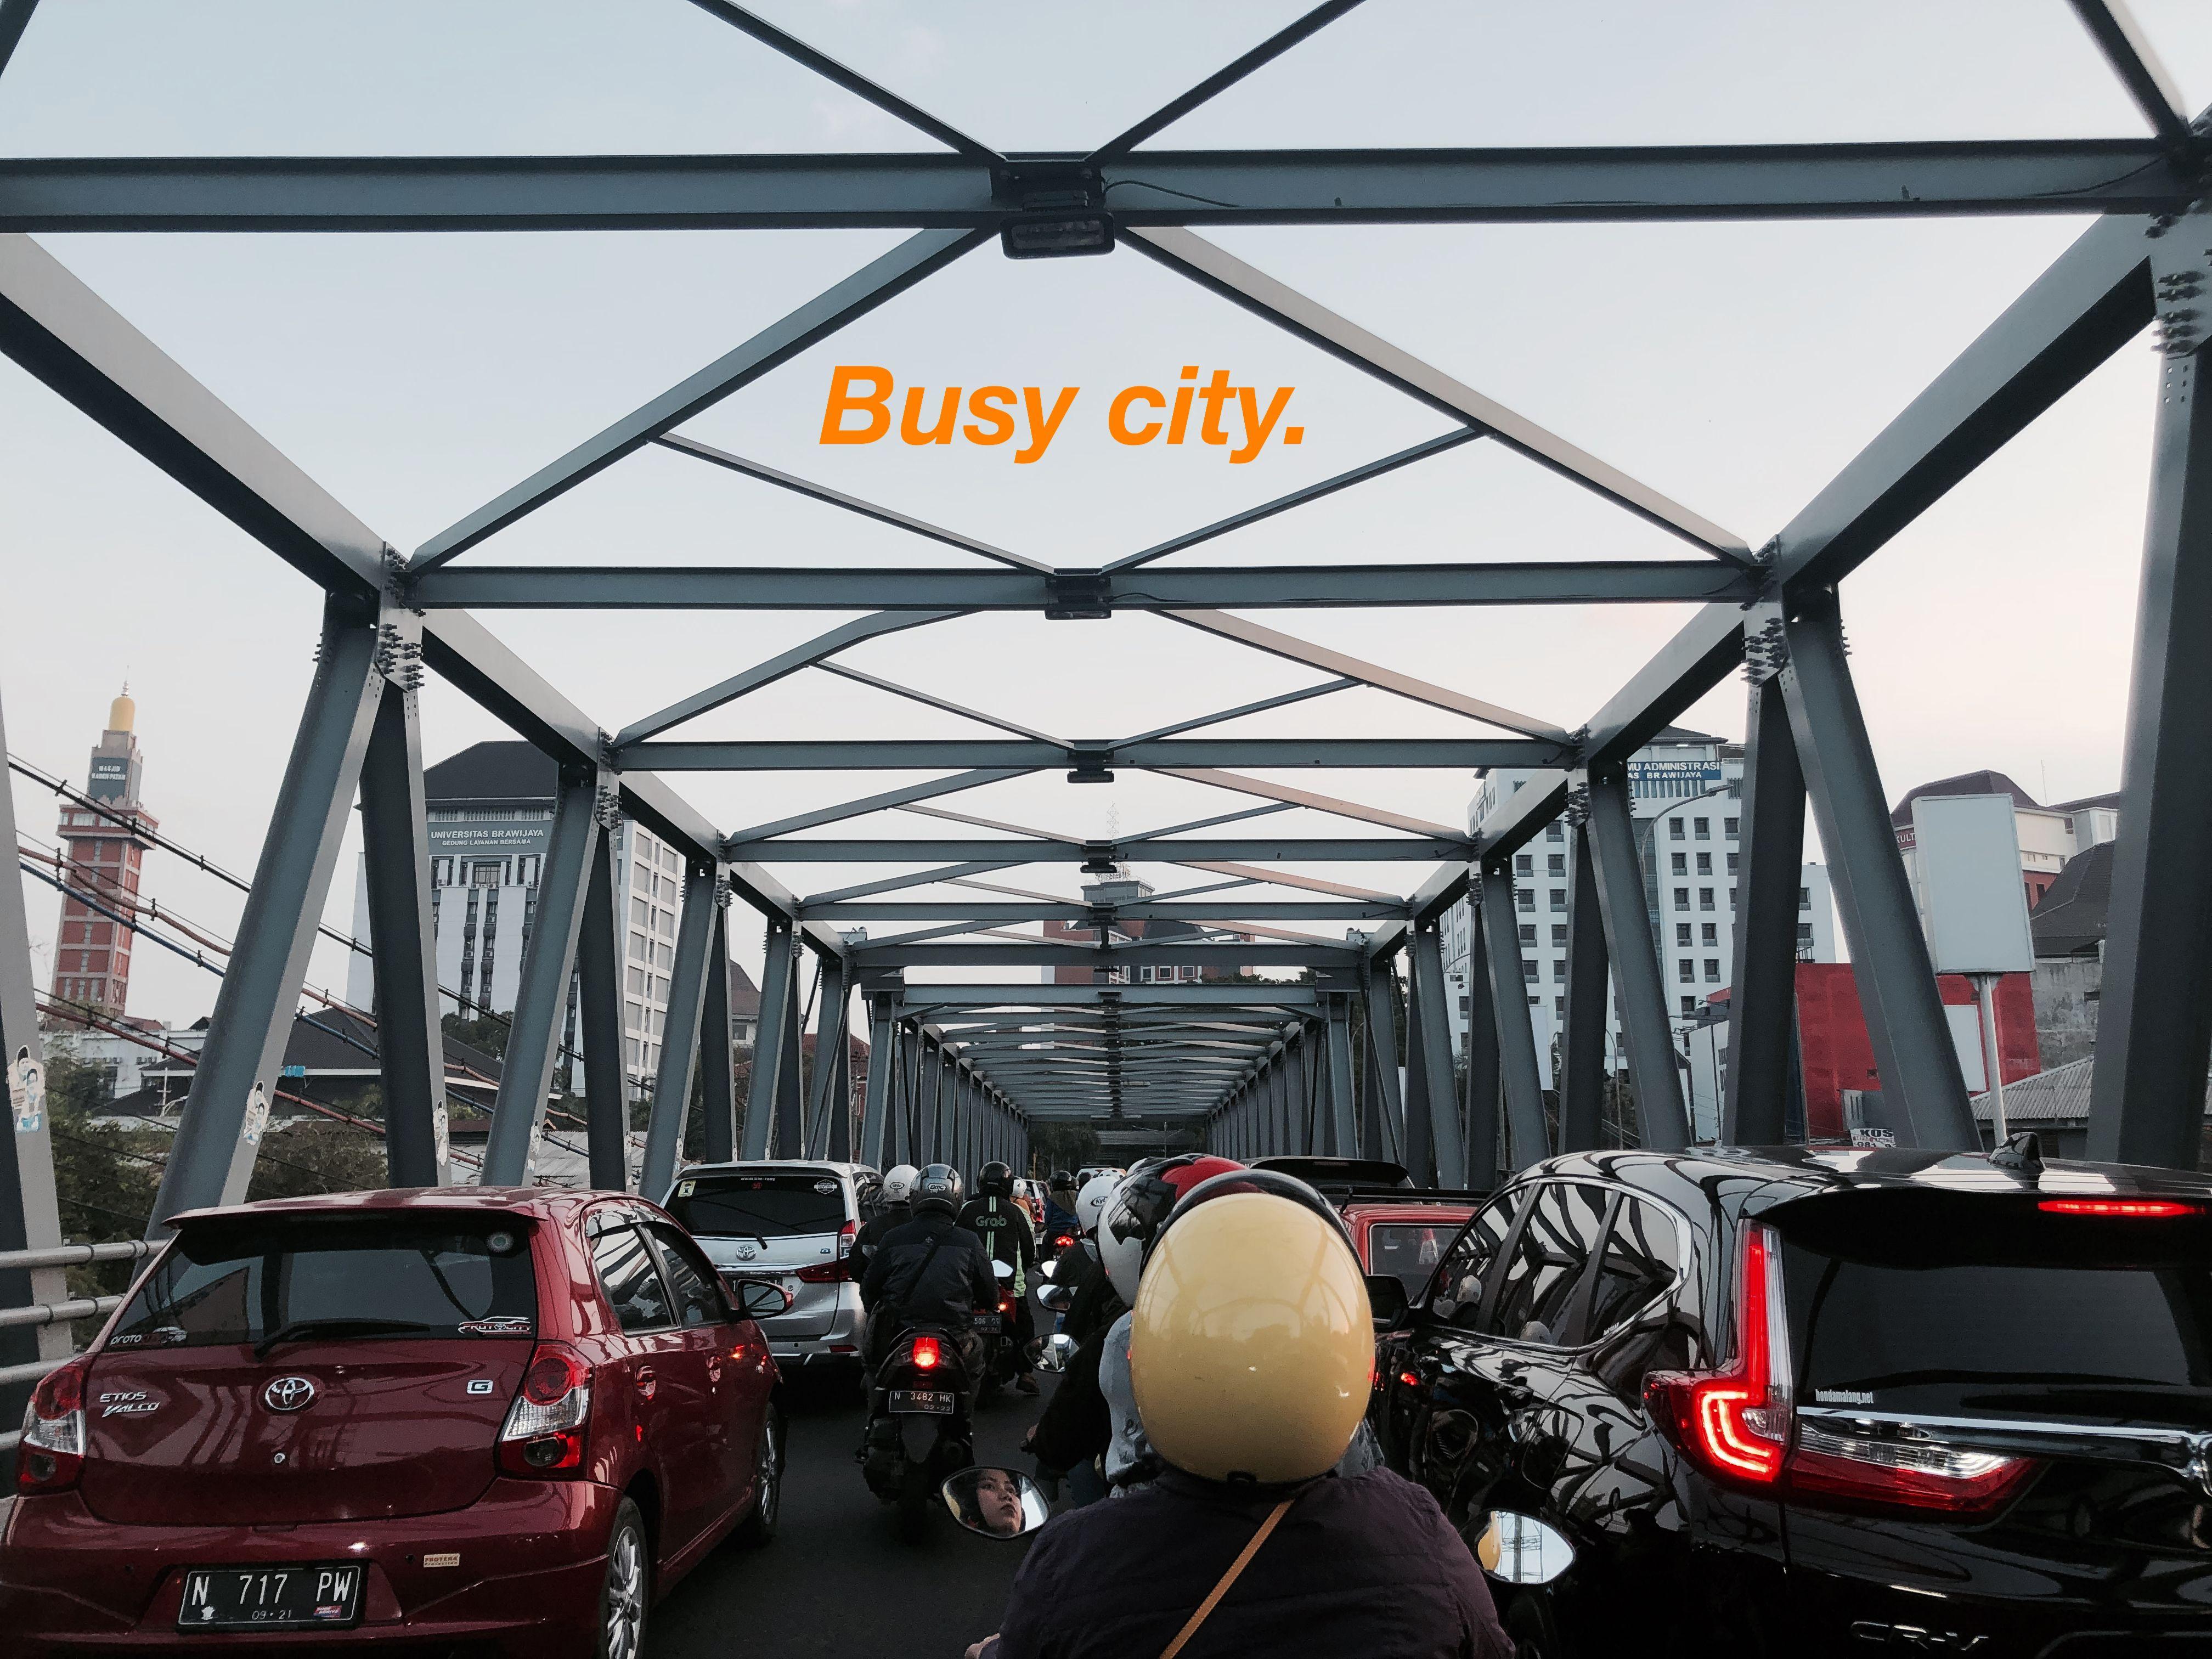 Busy City Malang Fotografi Perjalanan Gambar Kota Fotografi Alam